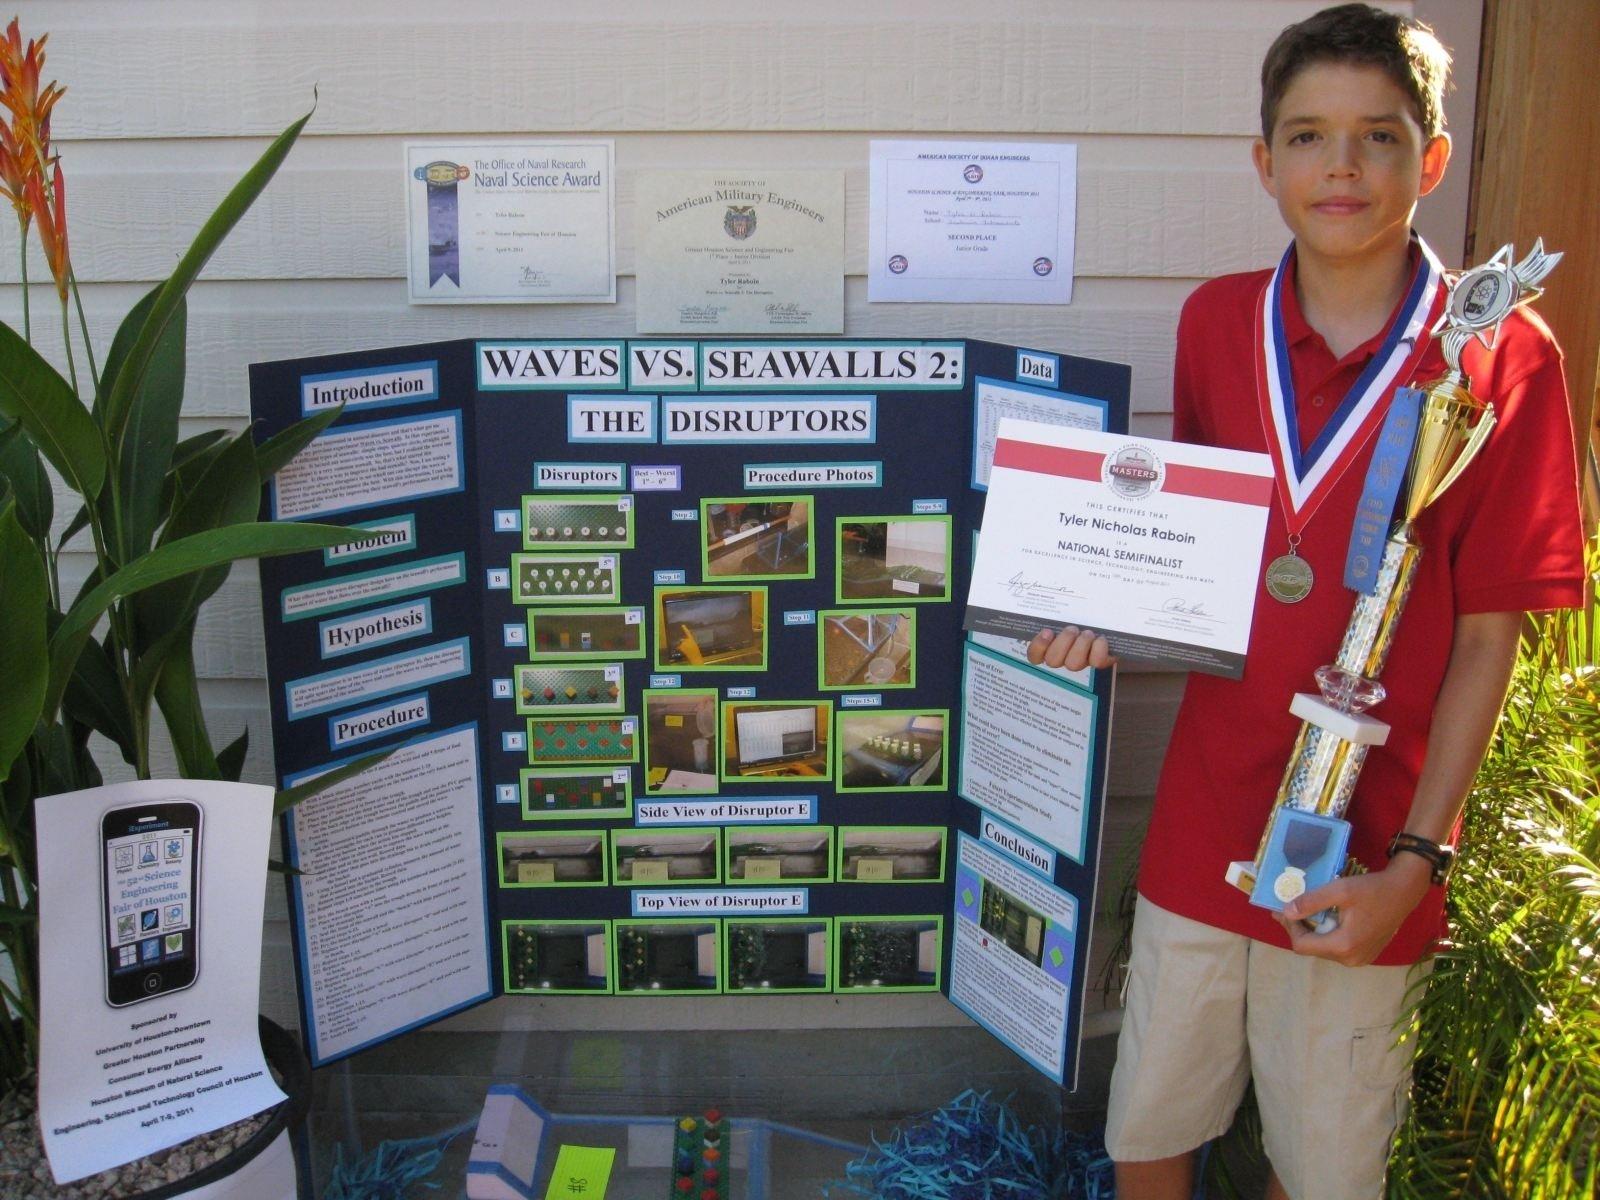 10 Famous Science Fair Project Ideas For 8Th Grade science project gidiye redformapolitica co 13 2021